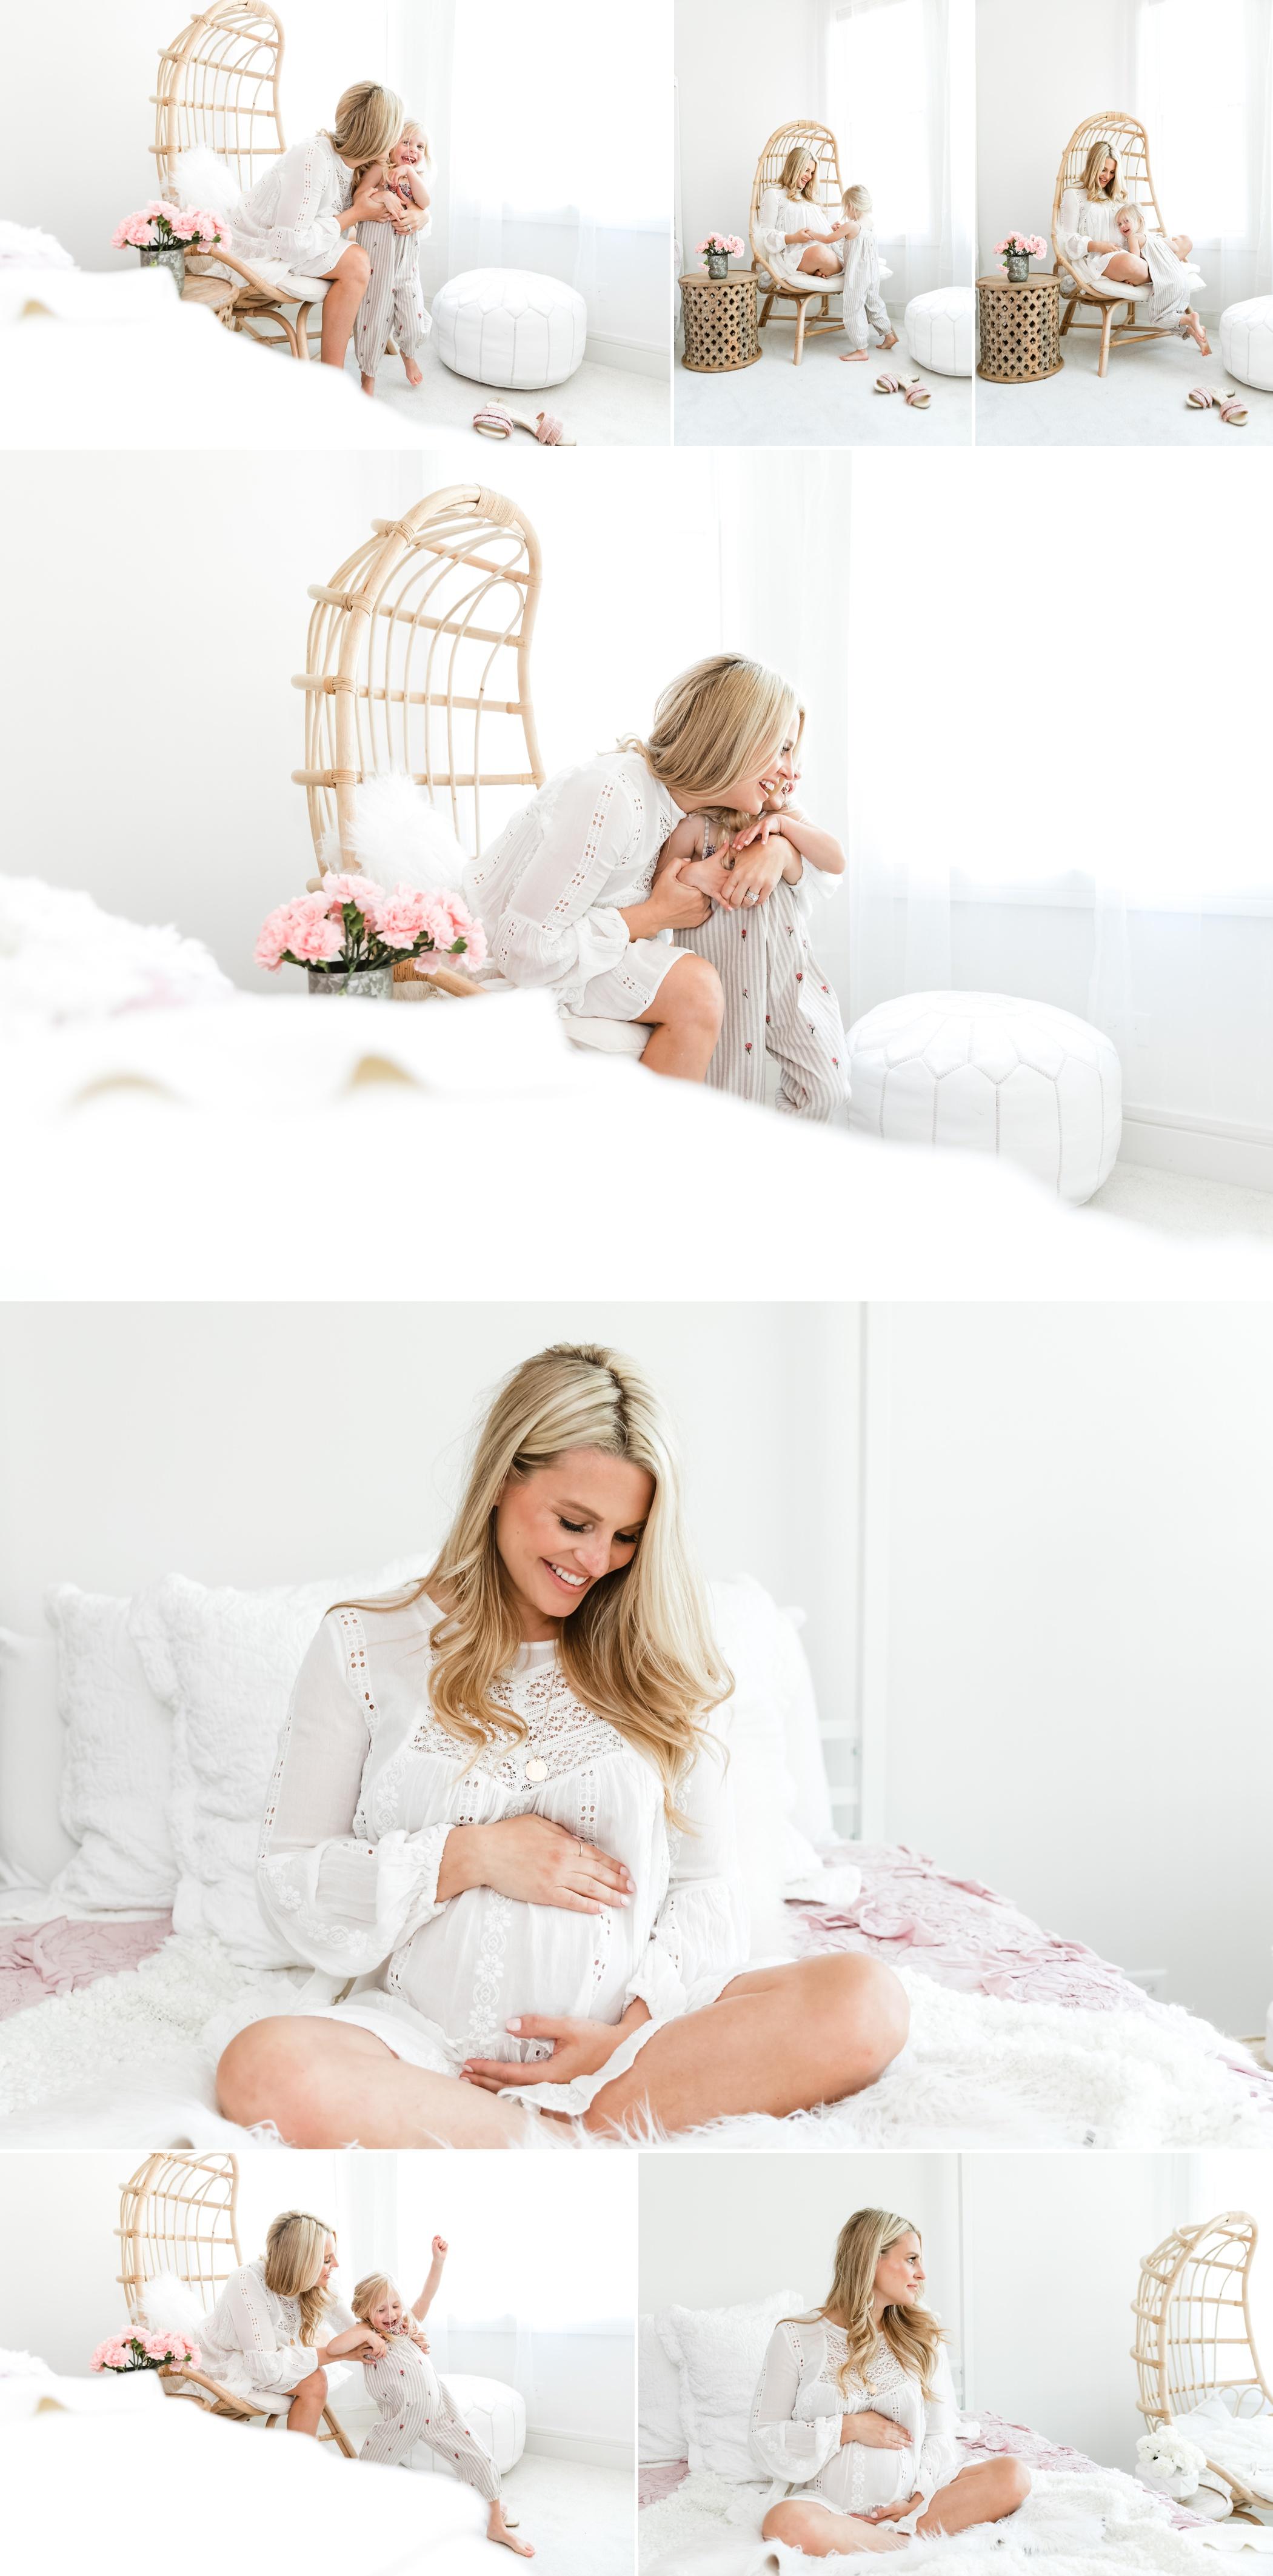 JGP Simple Session Chicago Maternity Blog 4.jpg